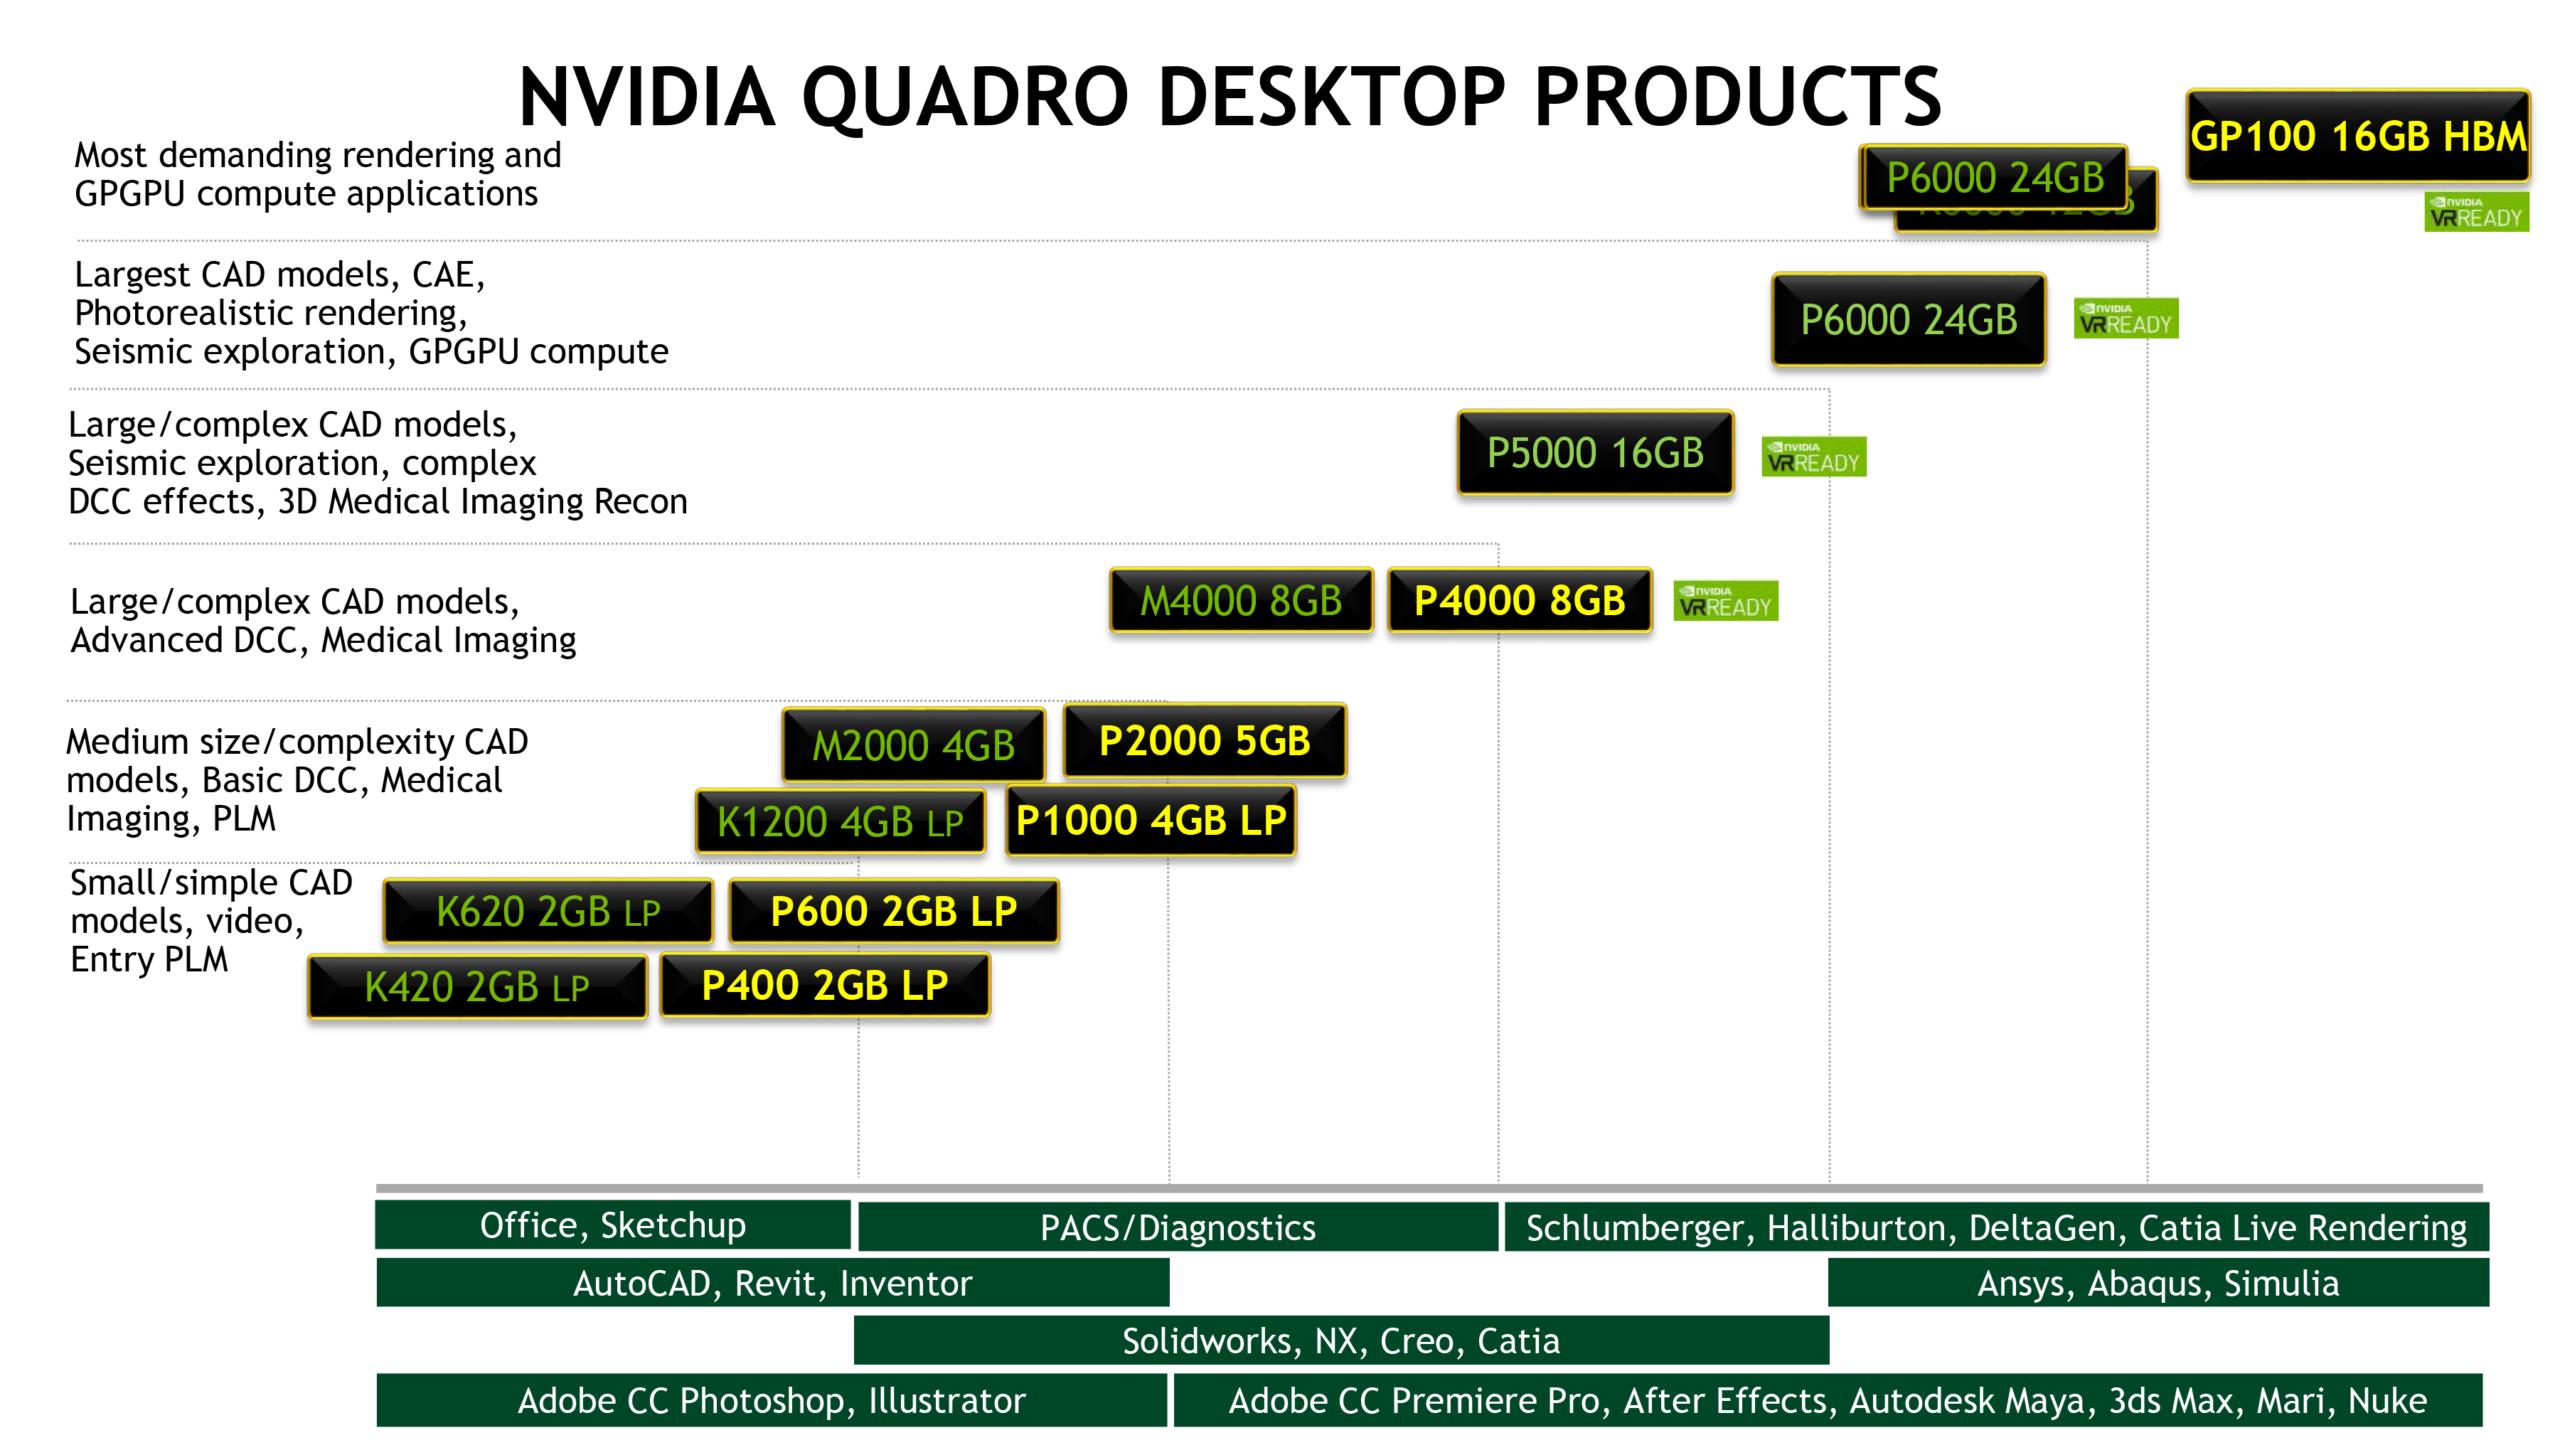 NVIDIA launches Quadro GP200 with 200GB HBM20   VideoCardz.com